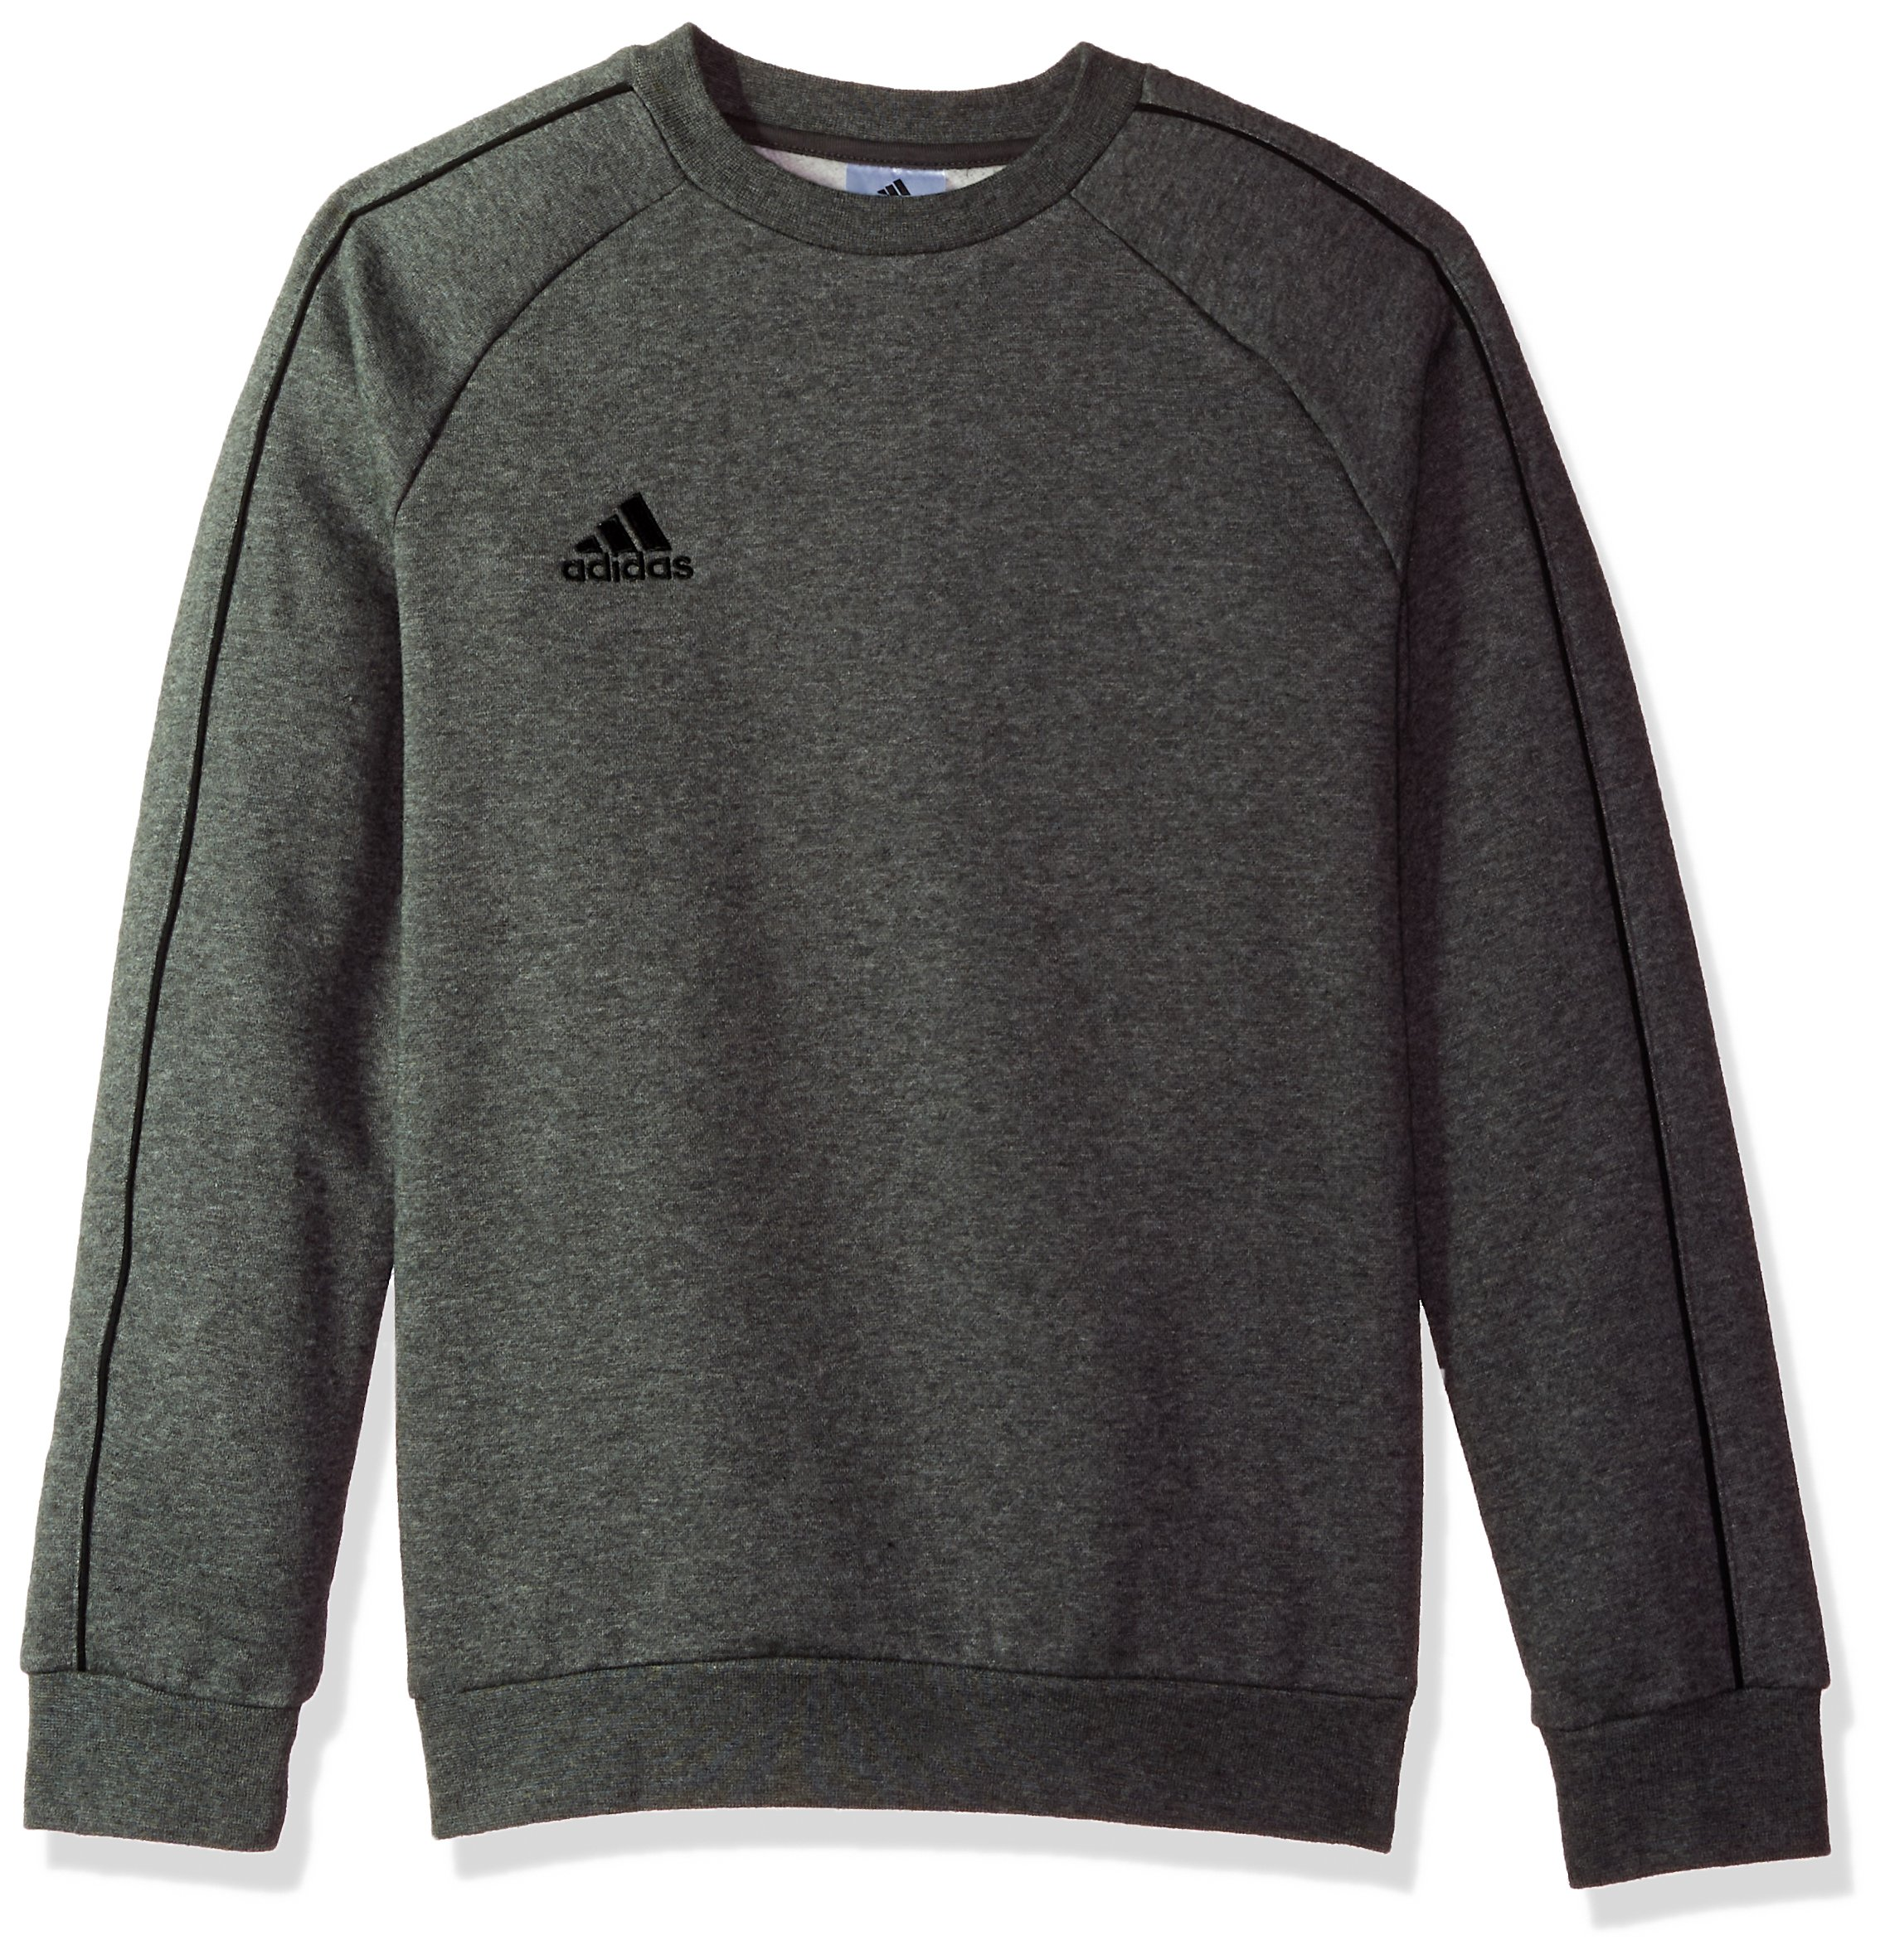 adidas Juniors' Core 18 Soccer Sweatshirt, Dark Grey Heather/Black, Medium by adidas